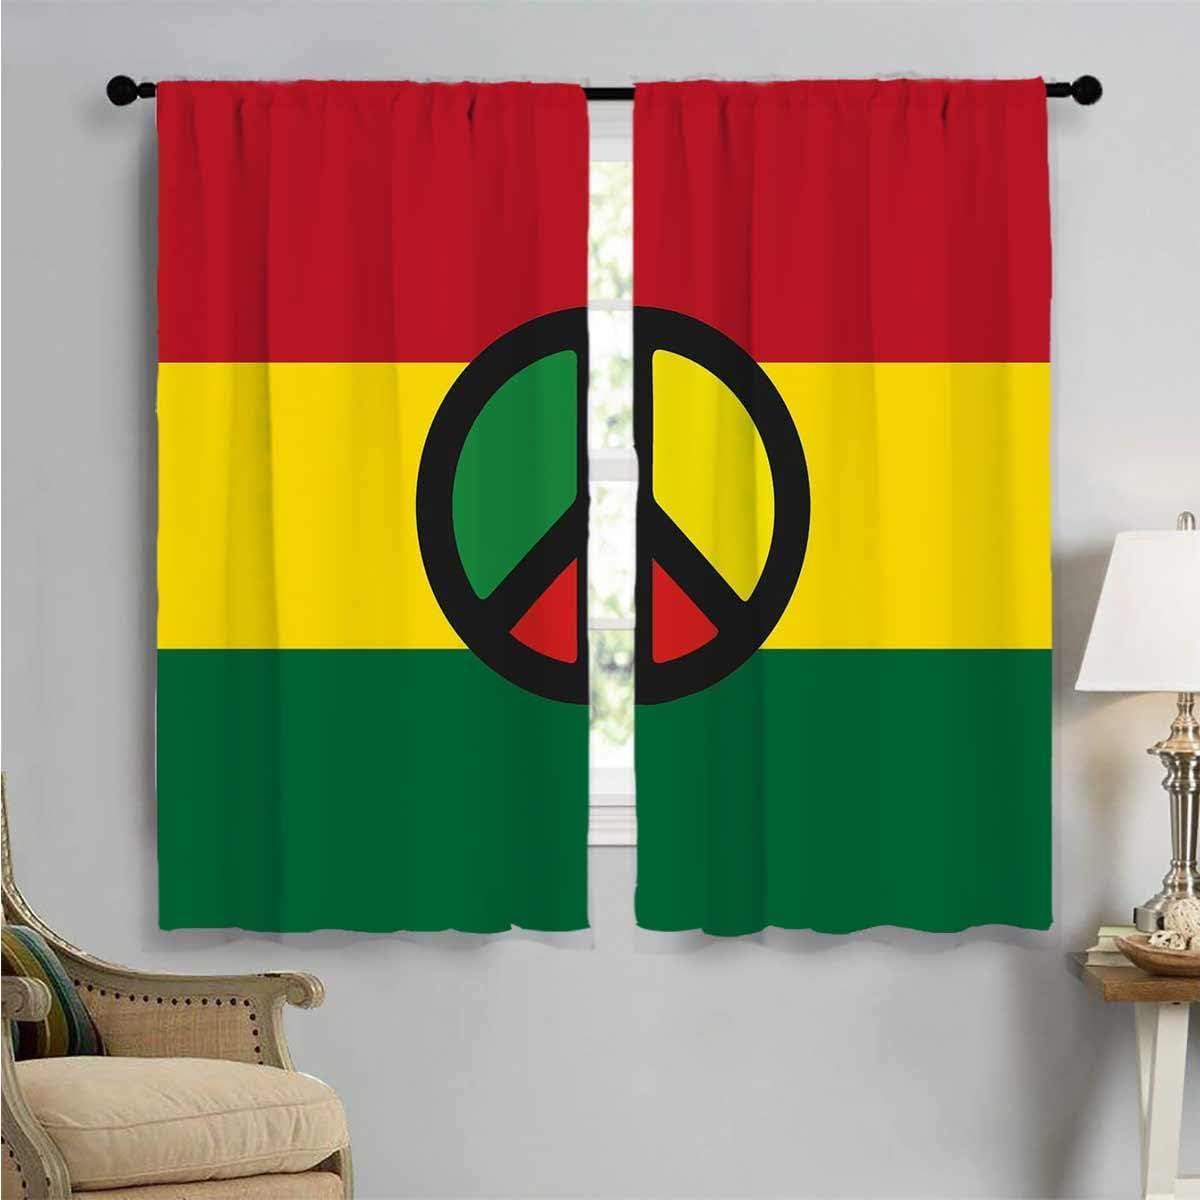 Blackout Window Brand new Curtain 2021 model Reggae Culture Peace Kids Room Artwork